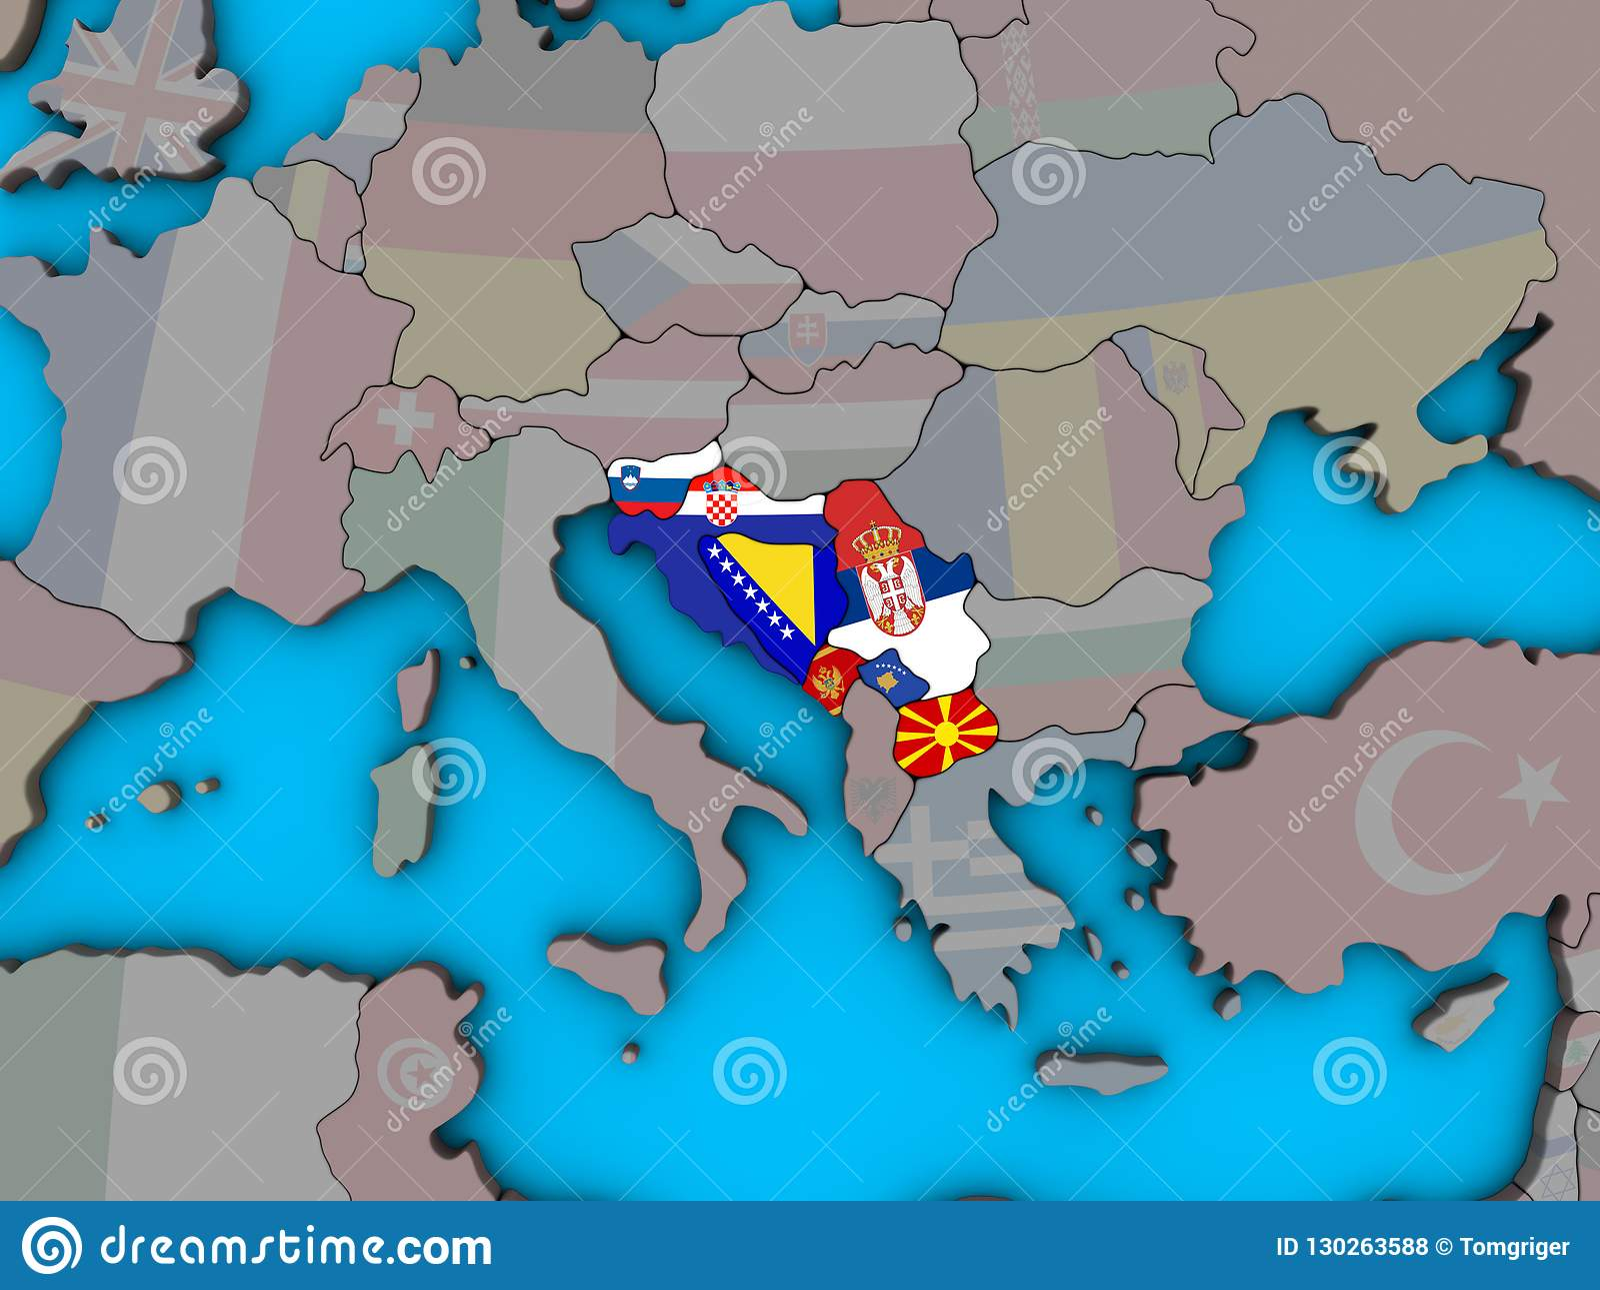 Jugoslawien Karte.Jugoslawien Mit Flaggen Auf Karte 3d Stock Abbildung Illustration